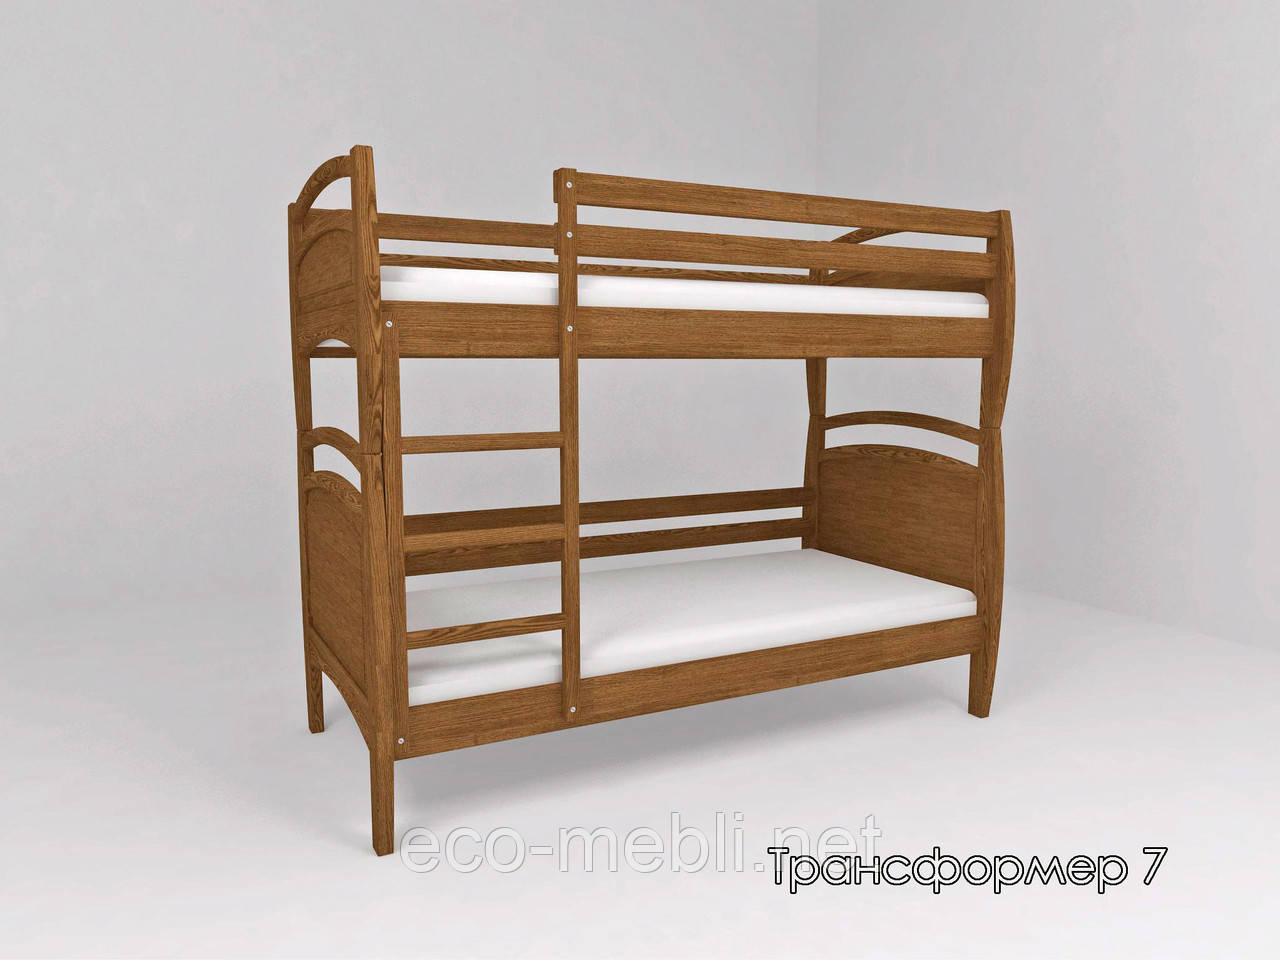 Ліжко ТИС Трансформер 7 (Сосна, Бук, Дуб)